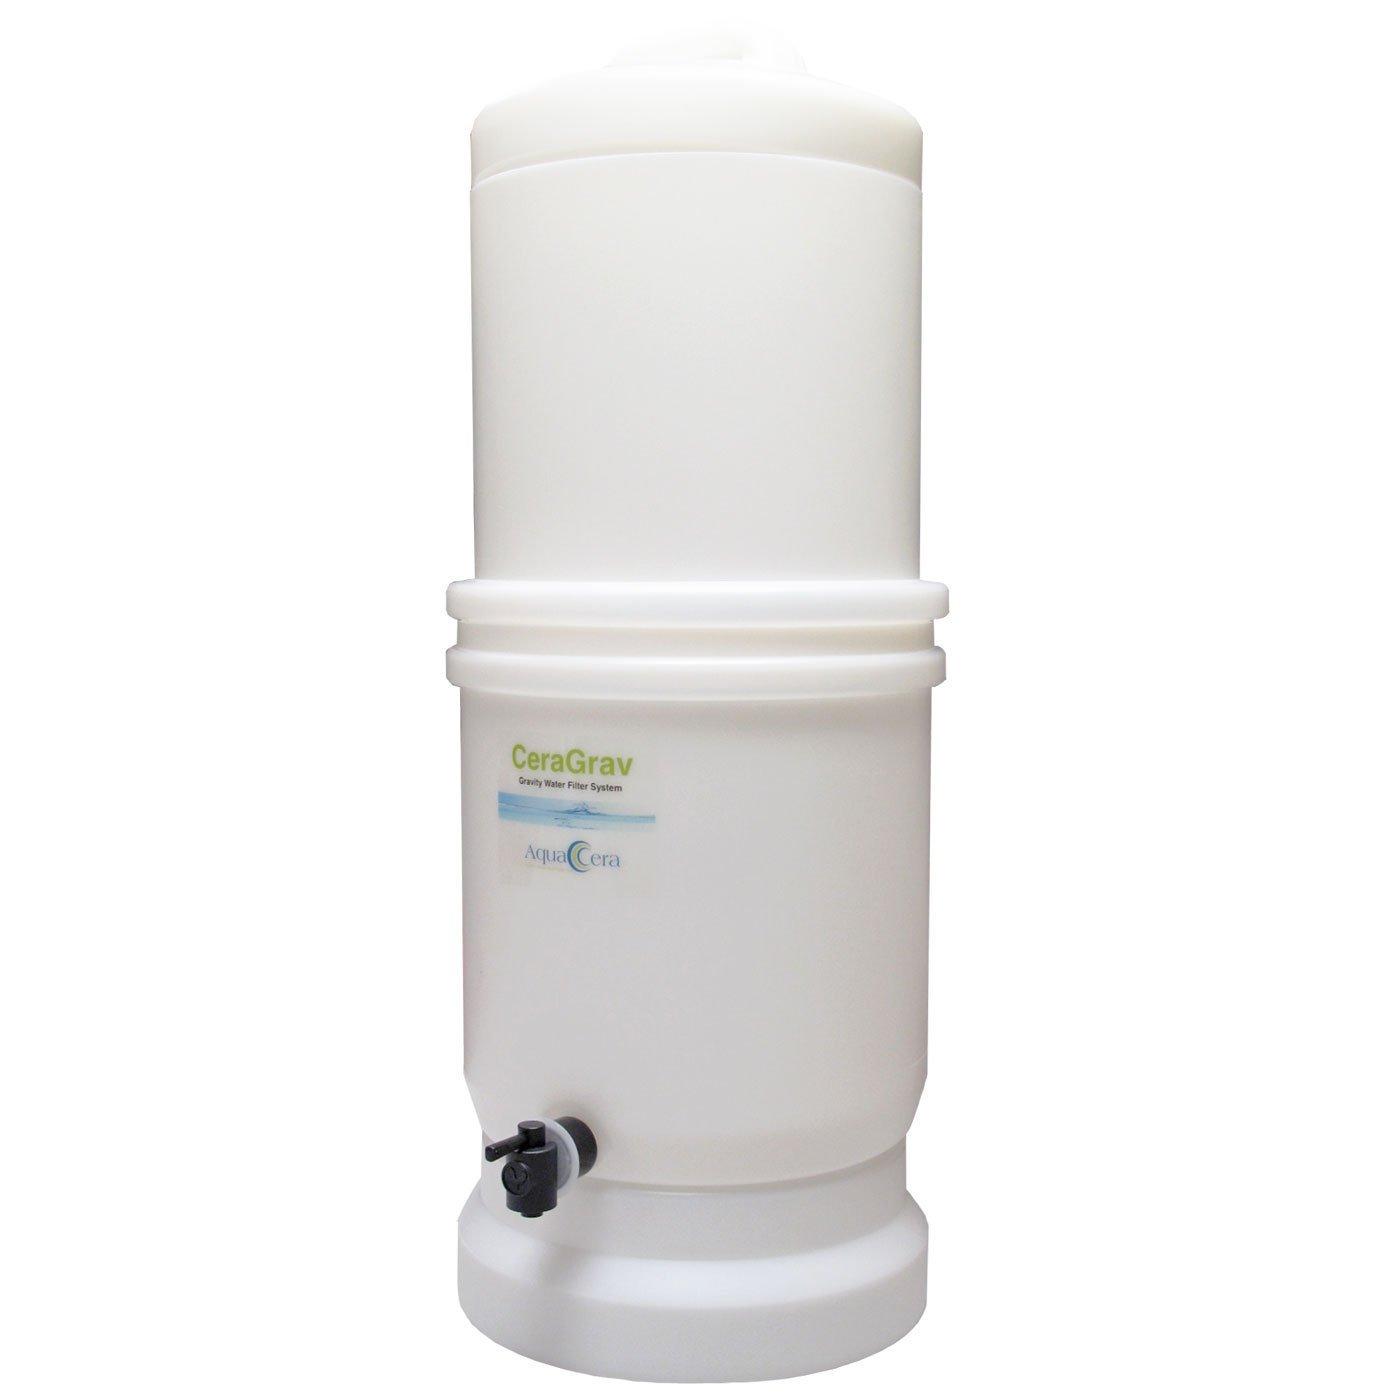 AquaCera Ceramic W9375000 LP-5 High Density Polyethylene Gravity Filter System